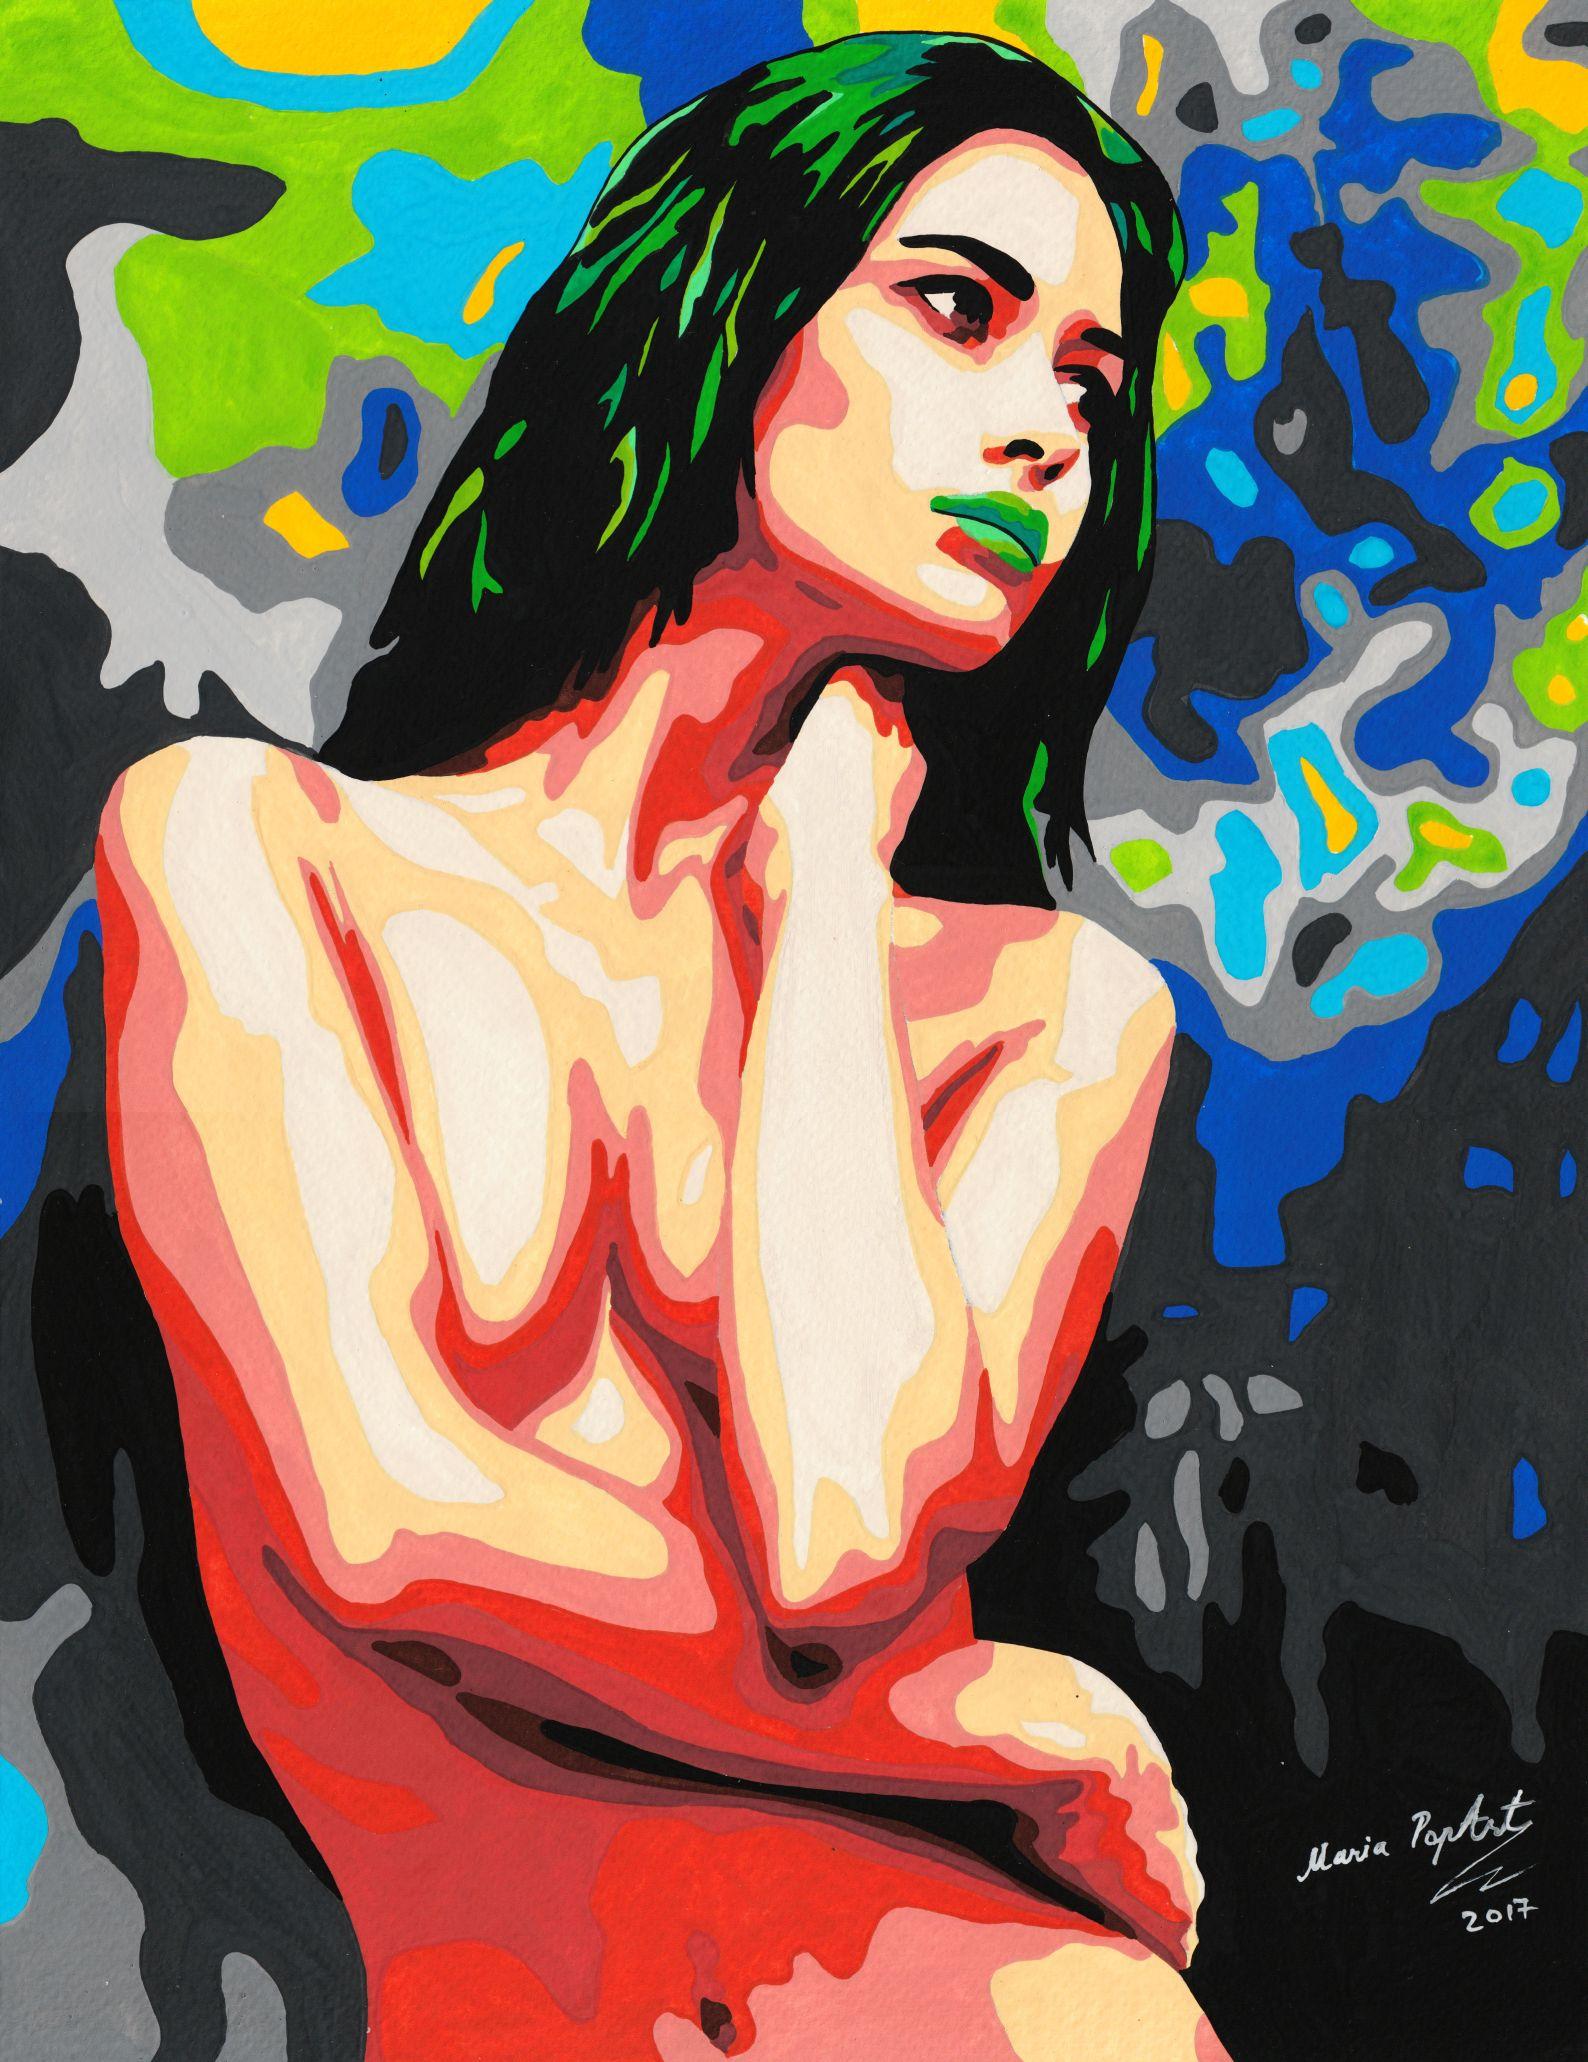 code-0095-la-grande-belezza-watercolor-27-x-35-cm